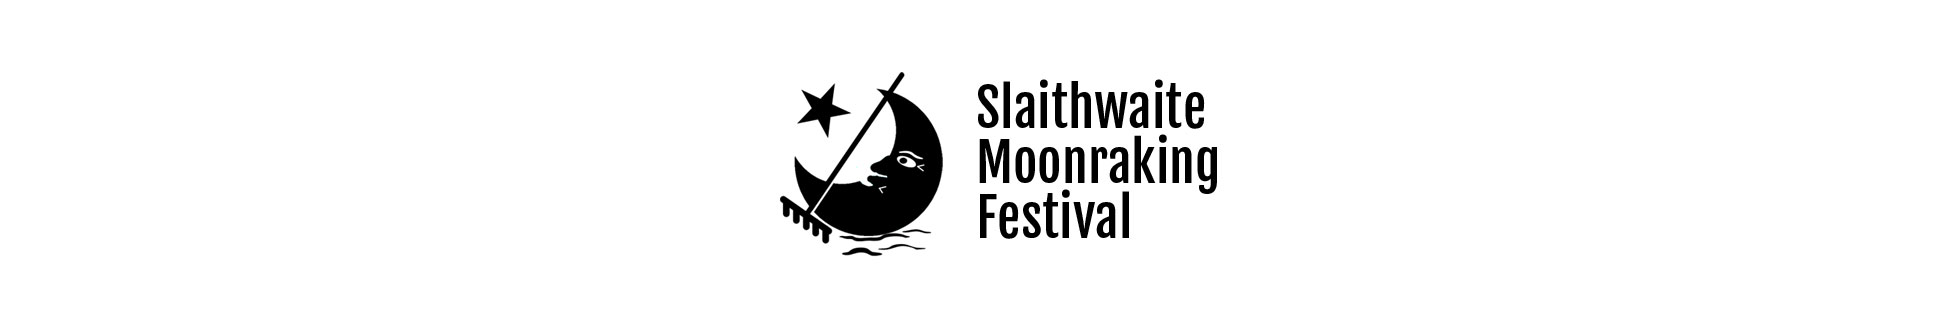 Slaithwaite Moonraking Logo